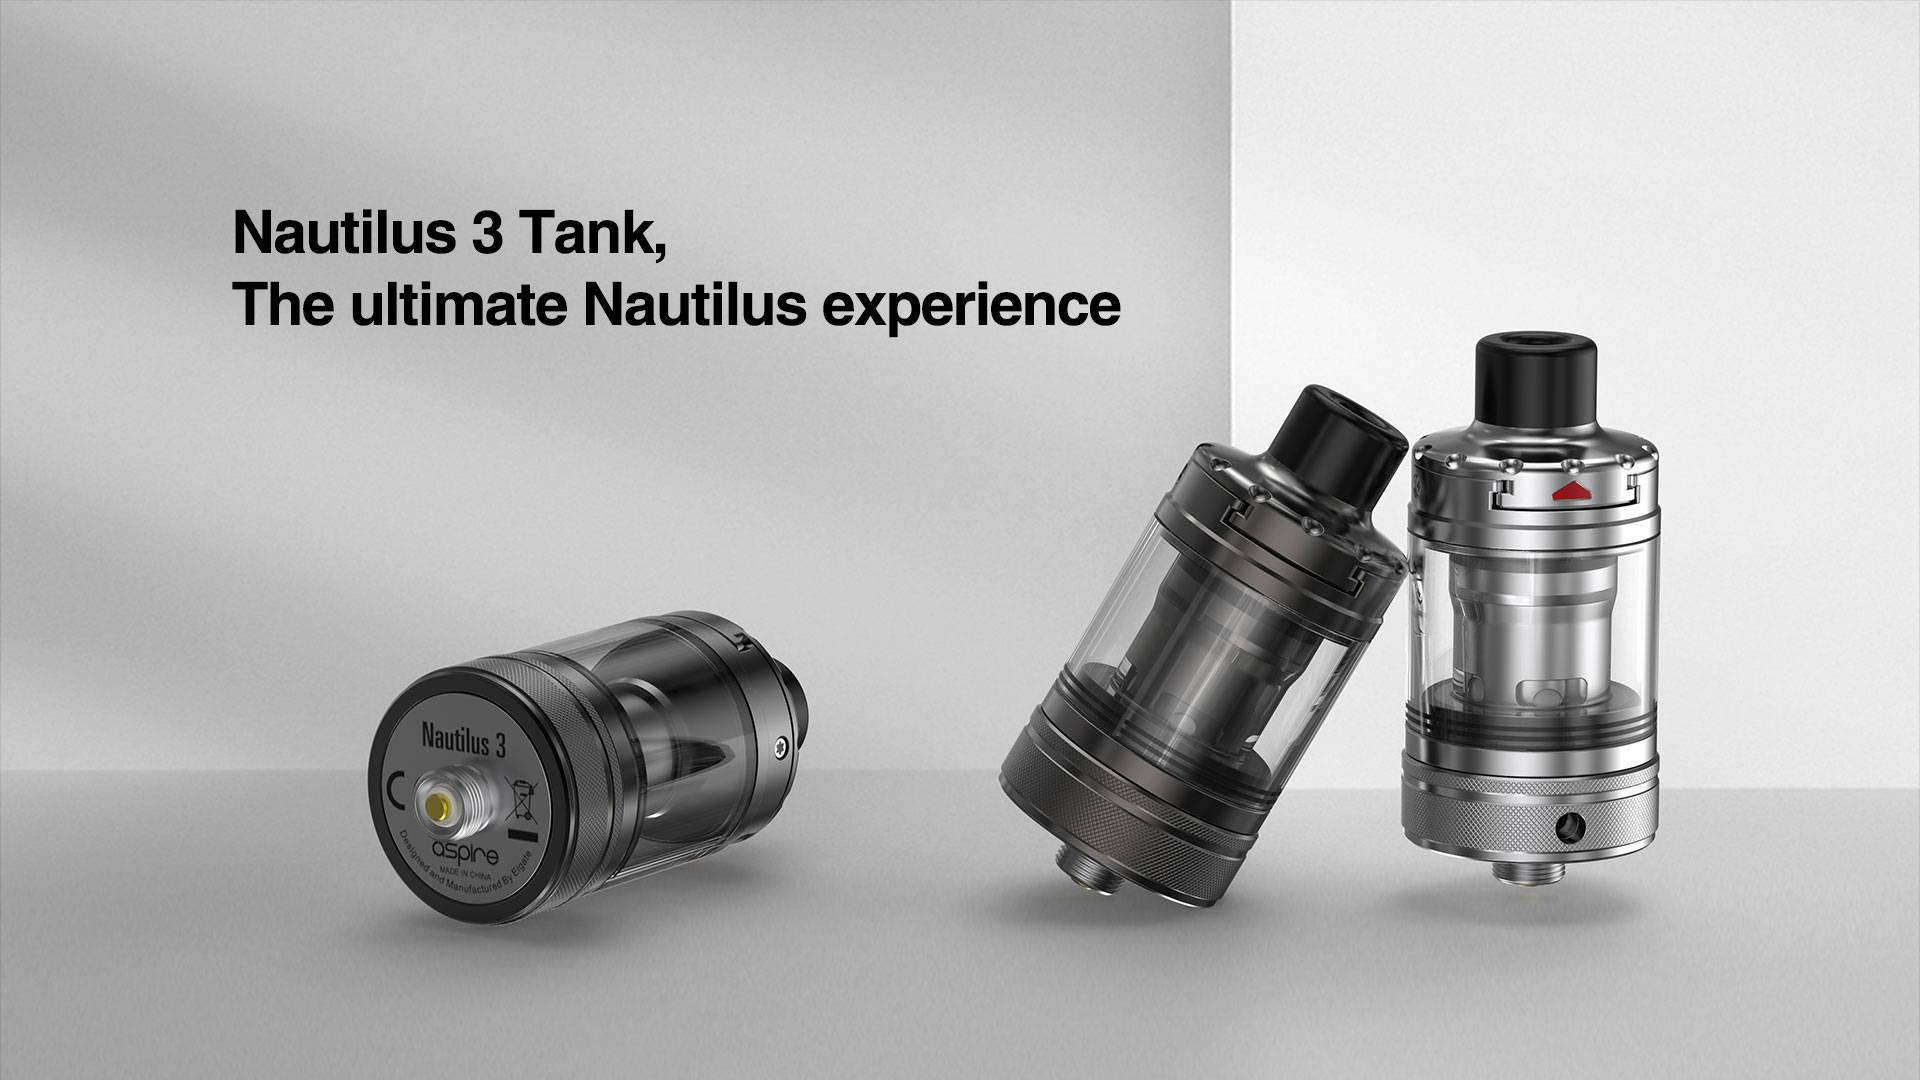 Nautilus 3 Tanks | Aspire MTL Tanks | Buy Nautilus 3 Tanks Online